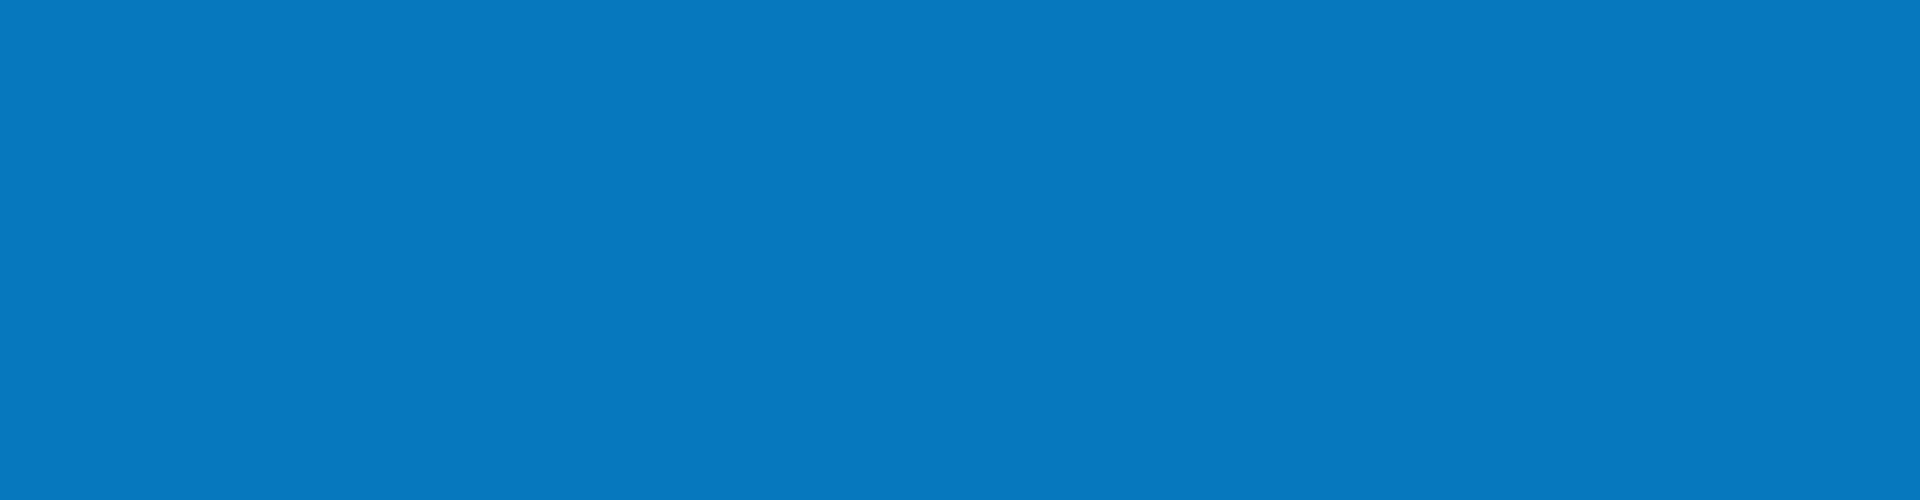 blue-background.jpg